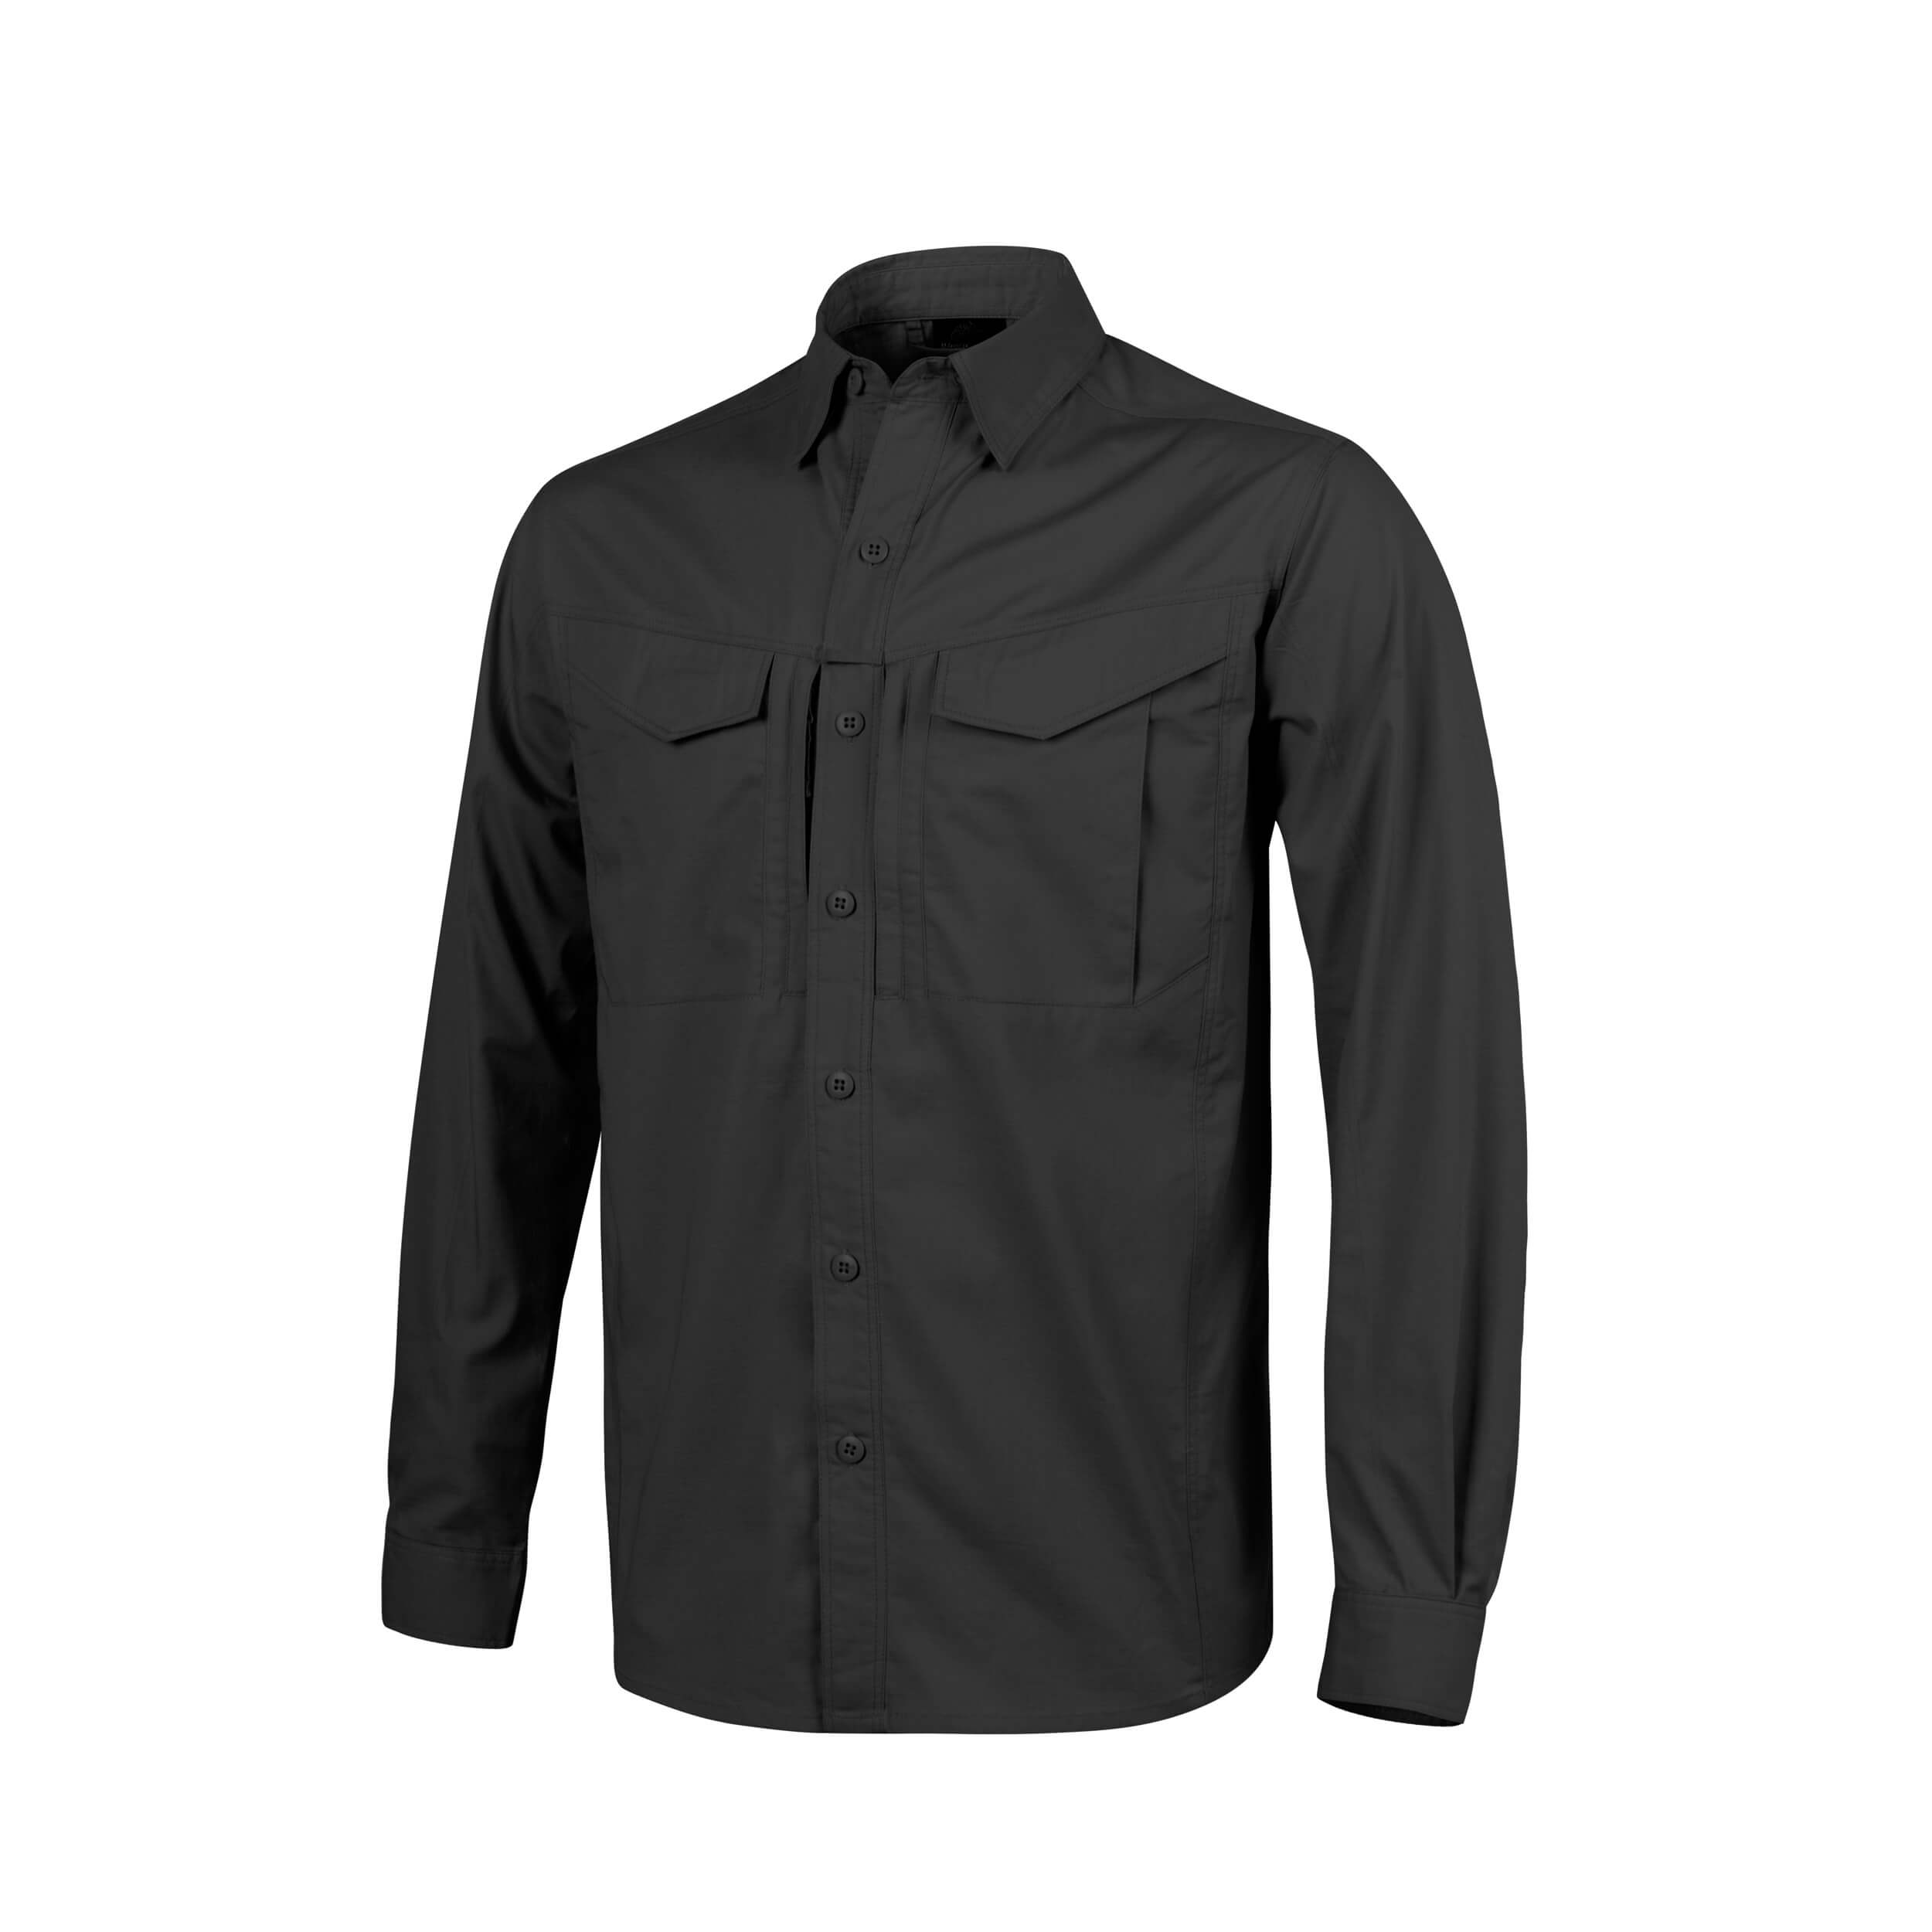 Helikon-Tex Defender Mk2 Long Sleeve Shirt -Polycotton Ripstop- Schwarz